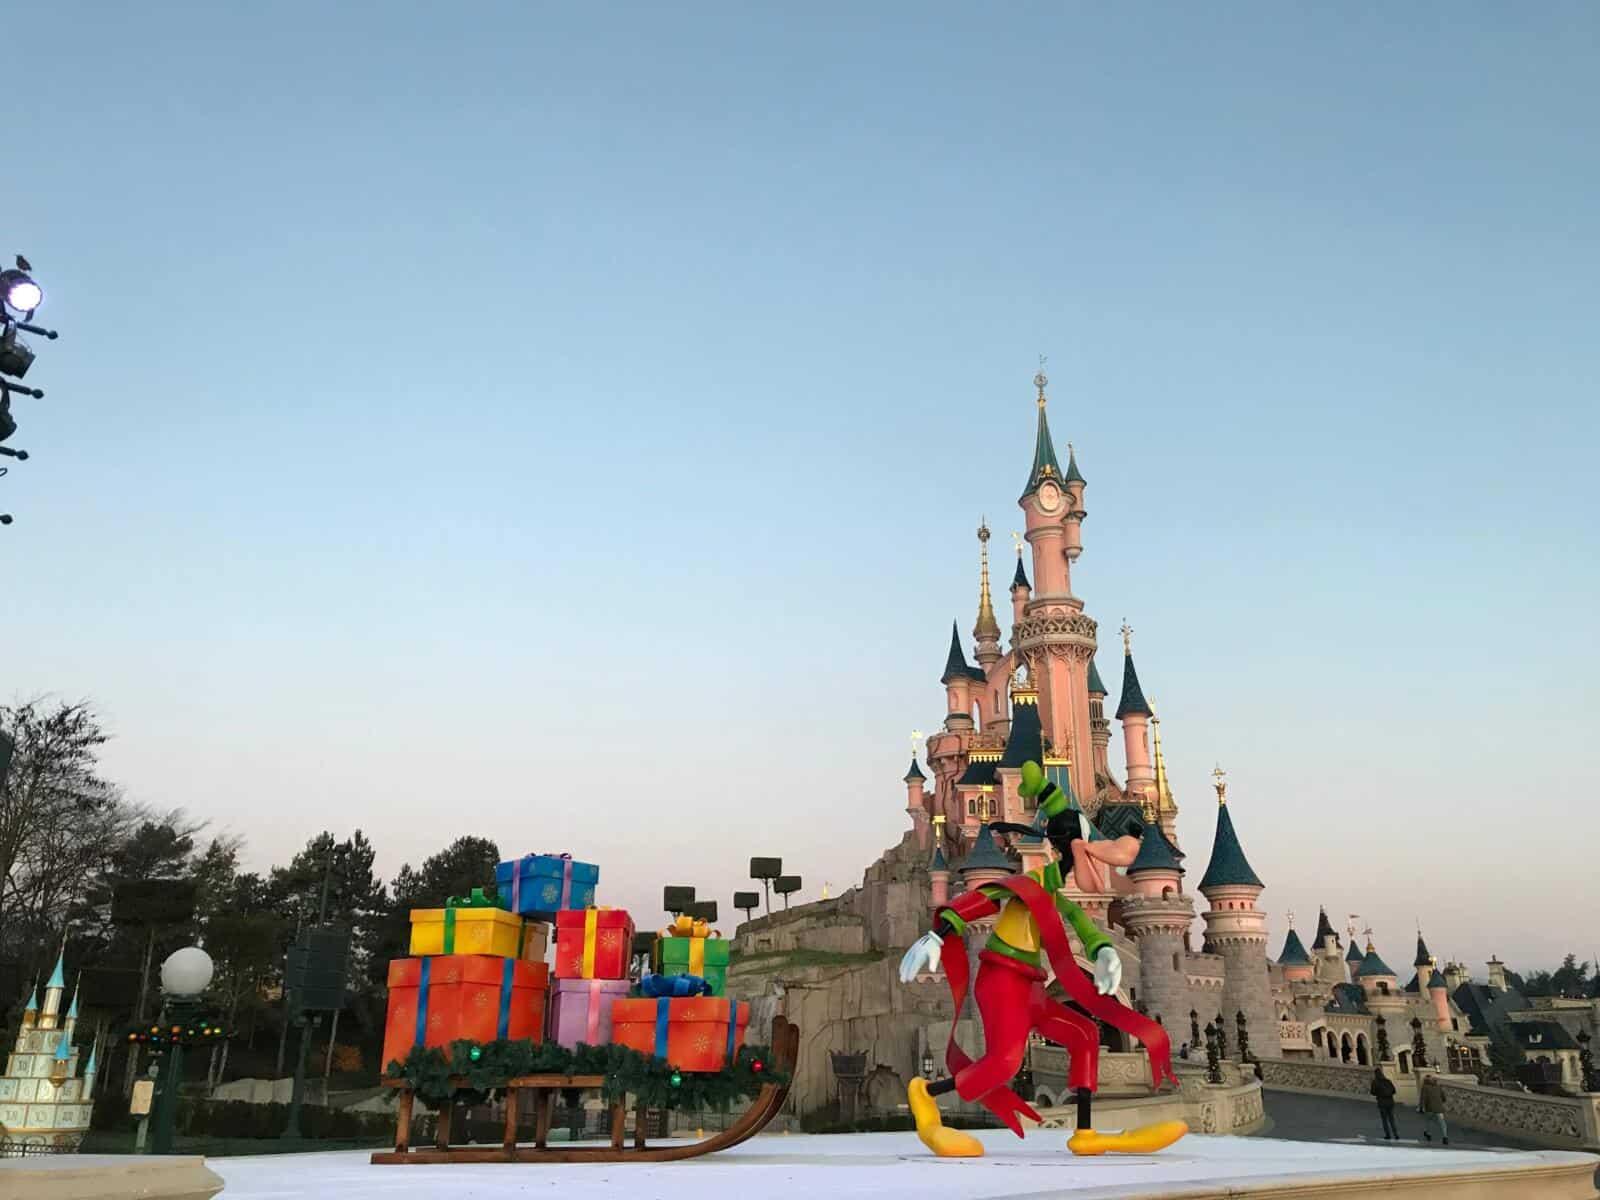 Visiting Disneyland Paris in December